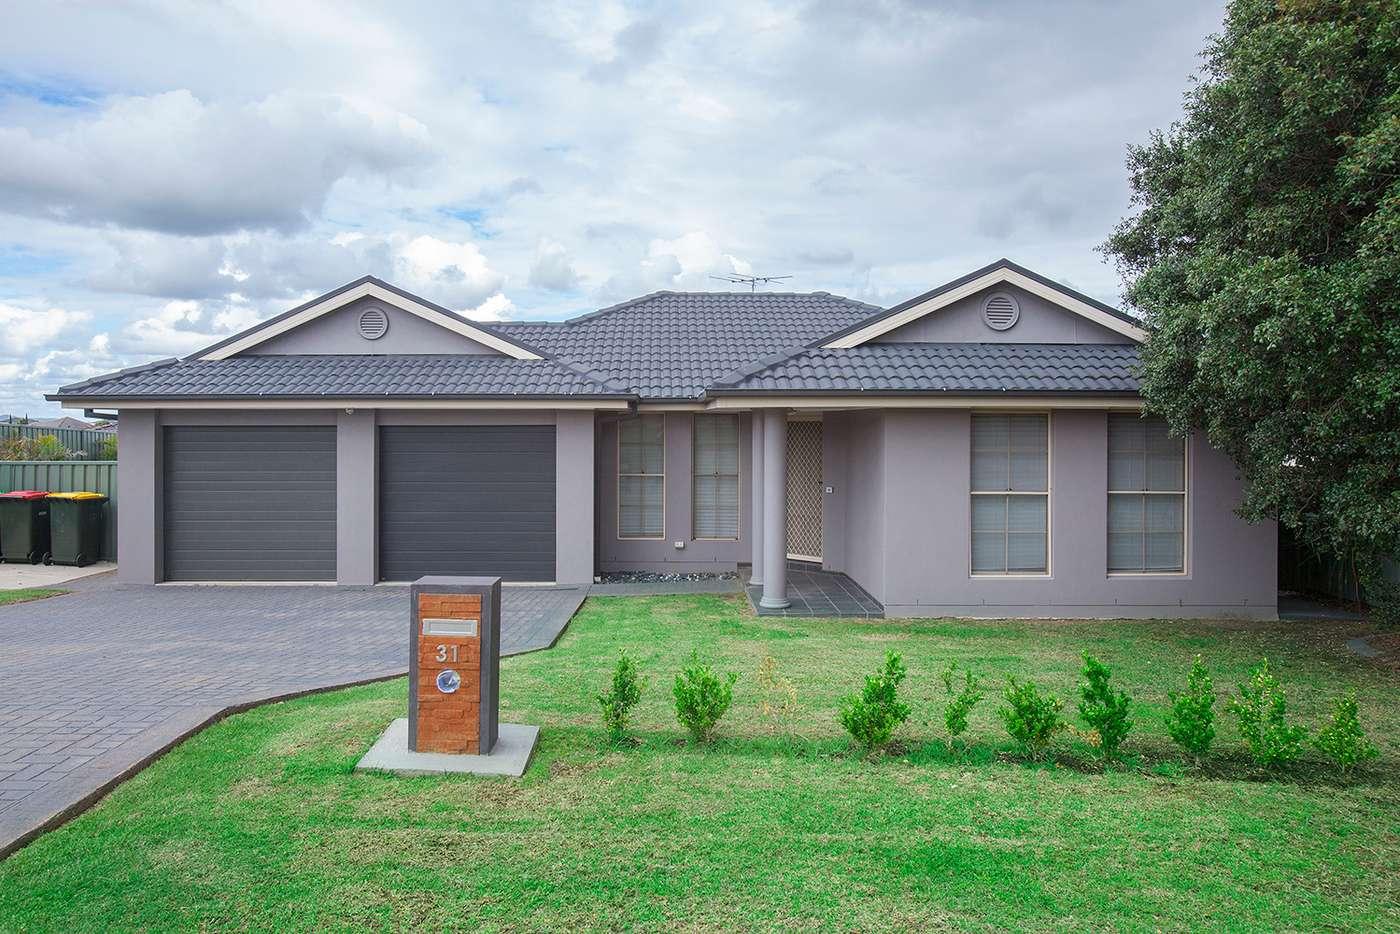 Main view of Homely house listing, 31 Lemonwood Circuit, Thornton NSW 2322